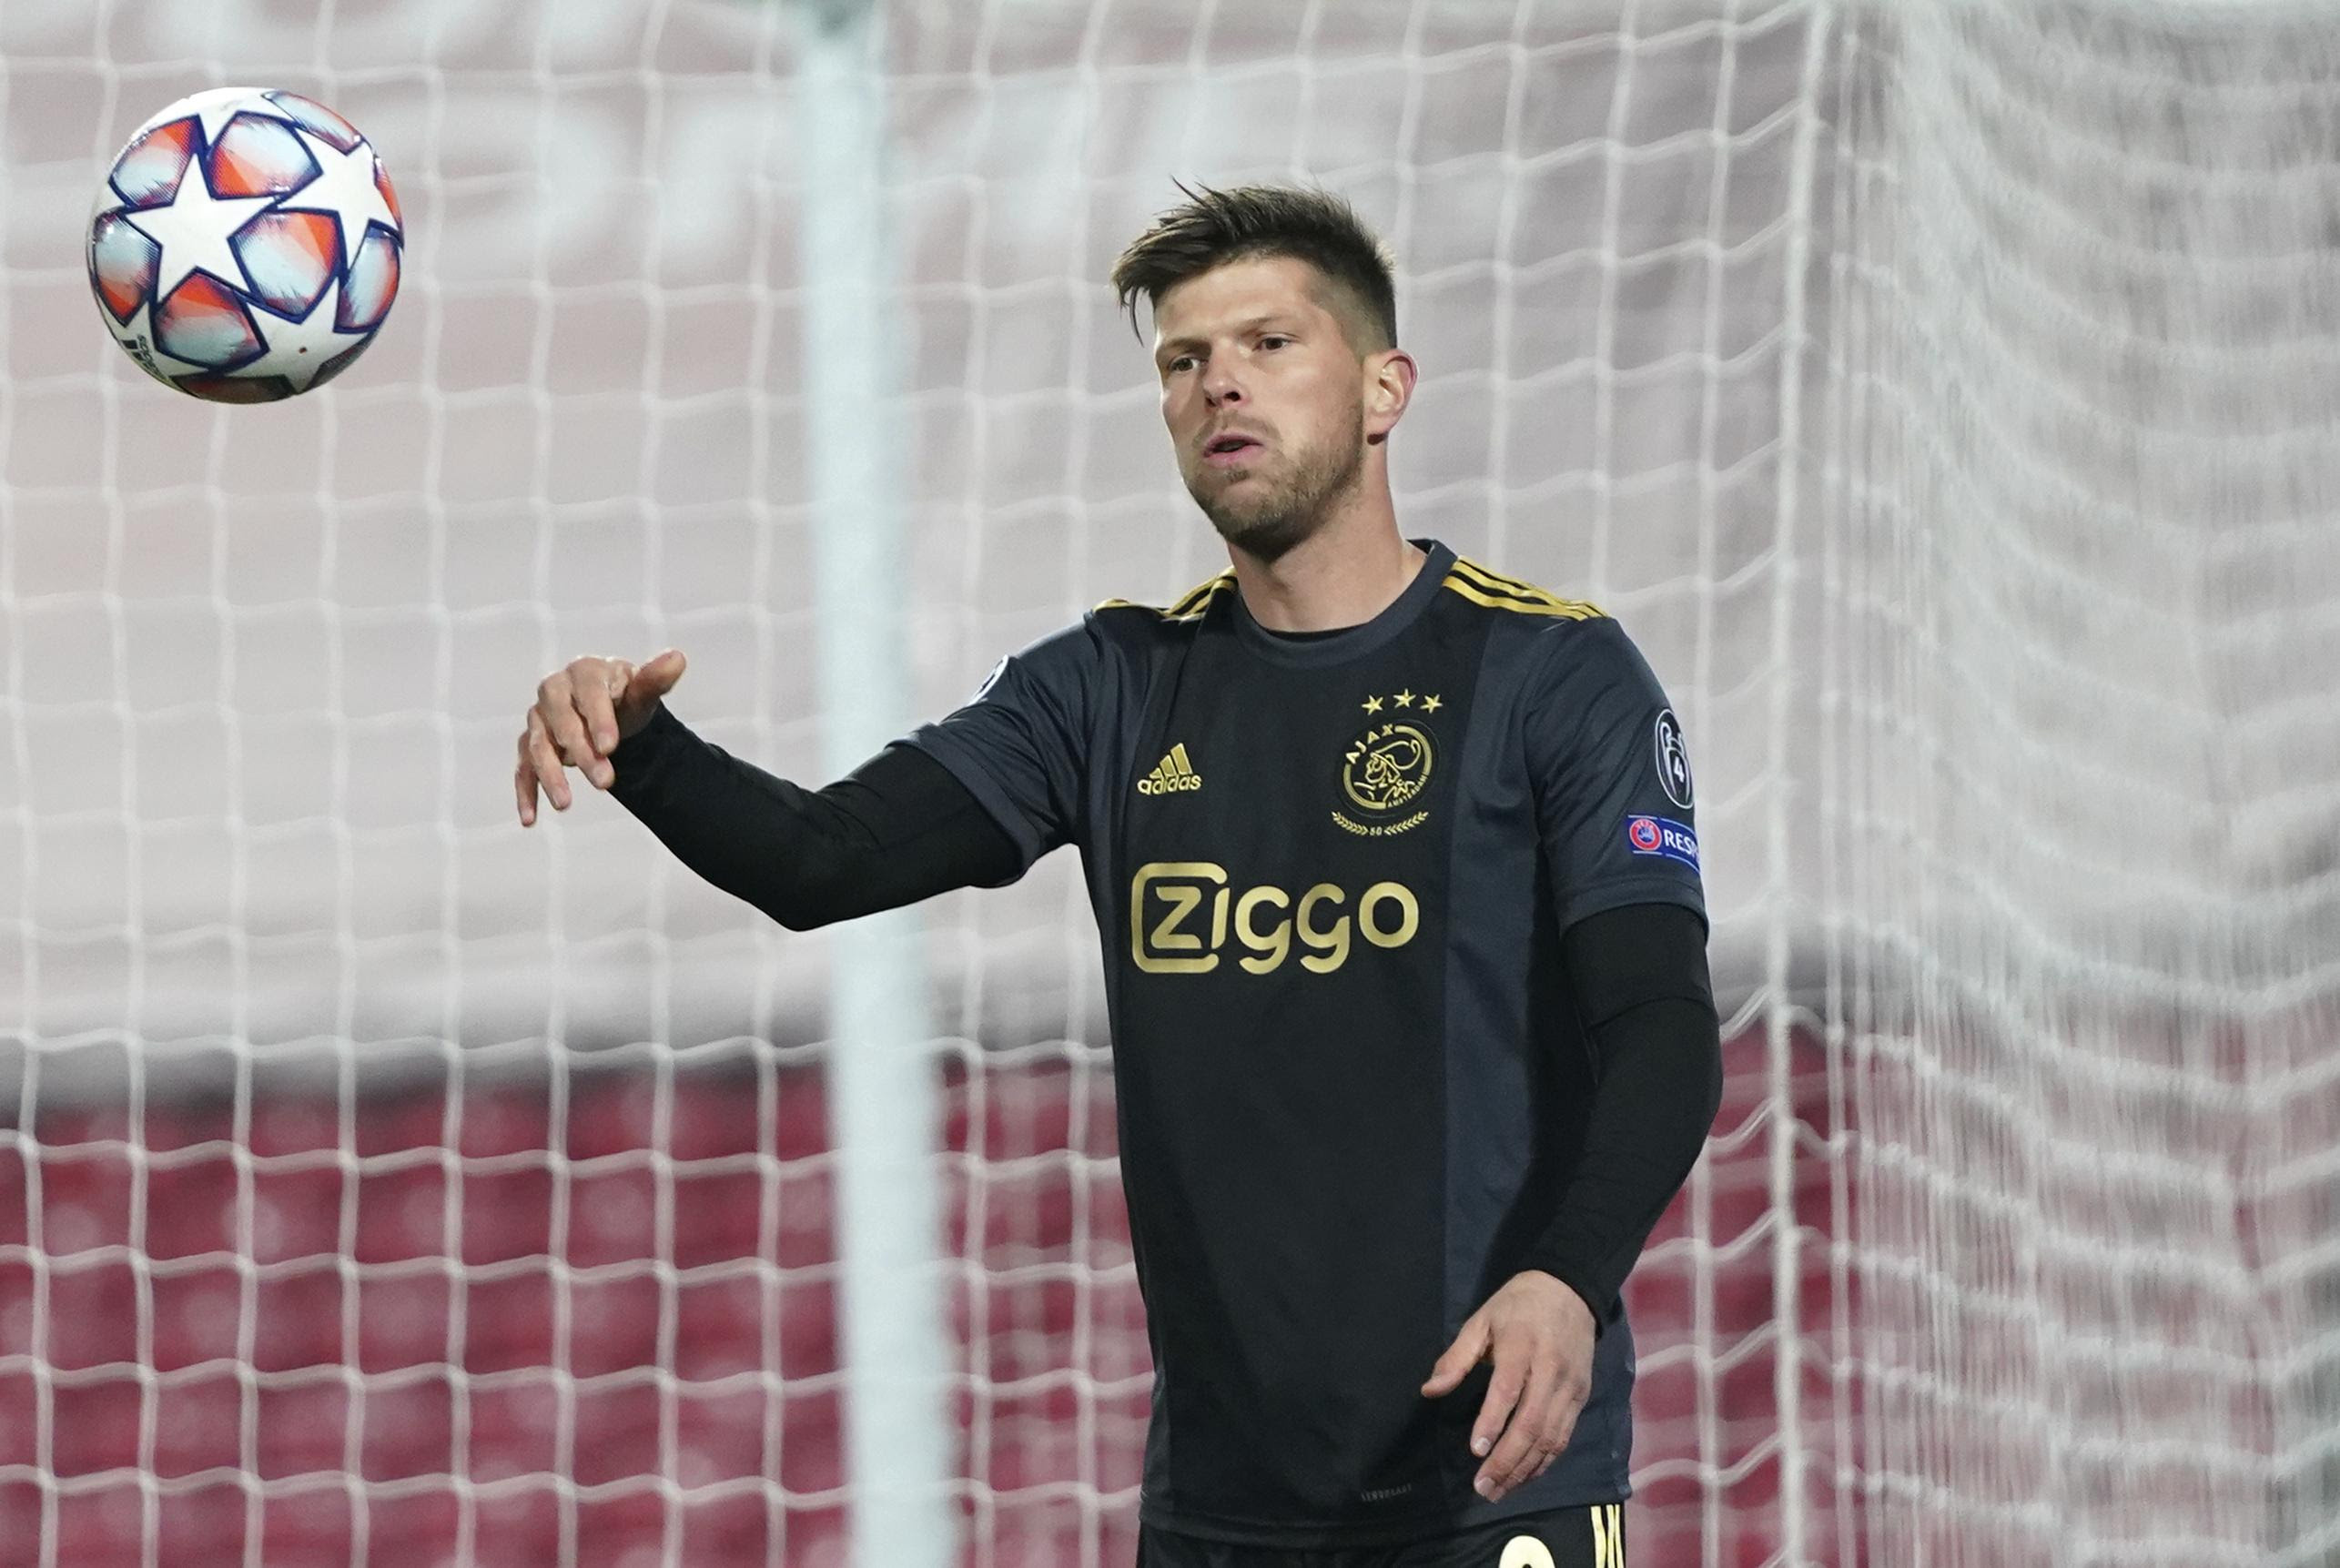 'Schalke 04 wil Klaas-Jan Huntelaar per direct terug'